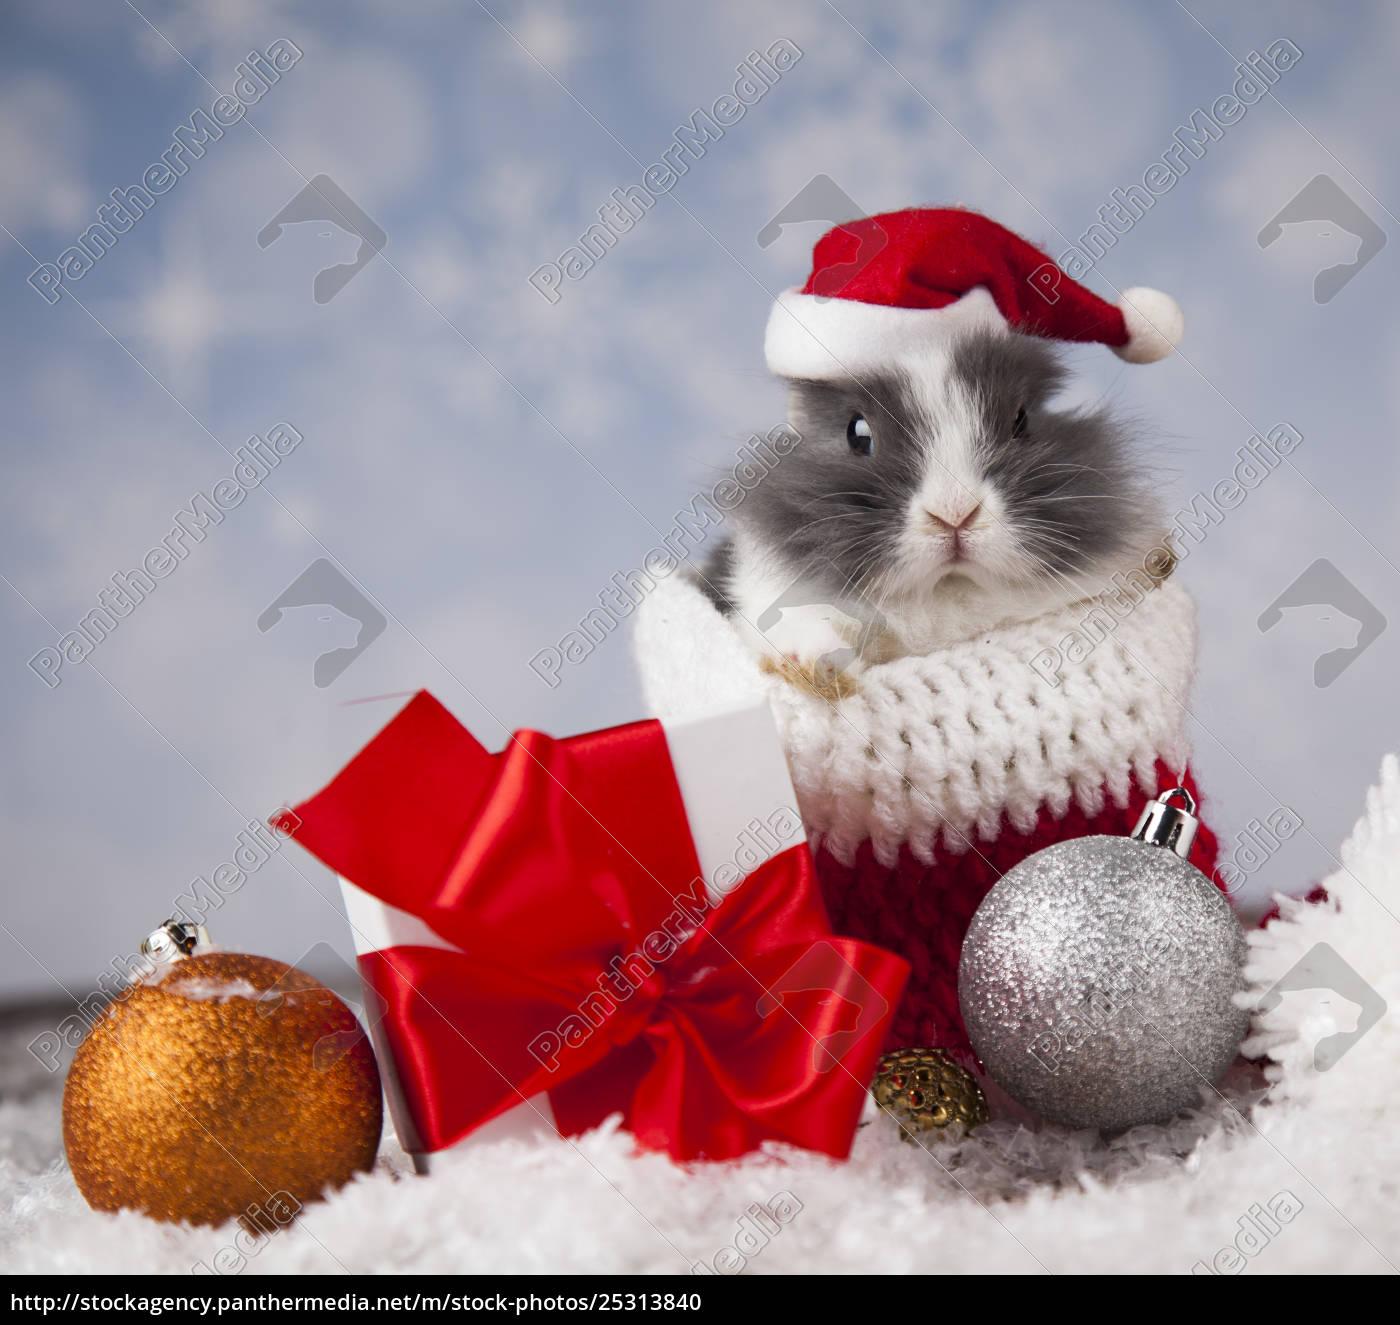 little, bunny, funny, rabbit, on, christmas, background - 25313840